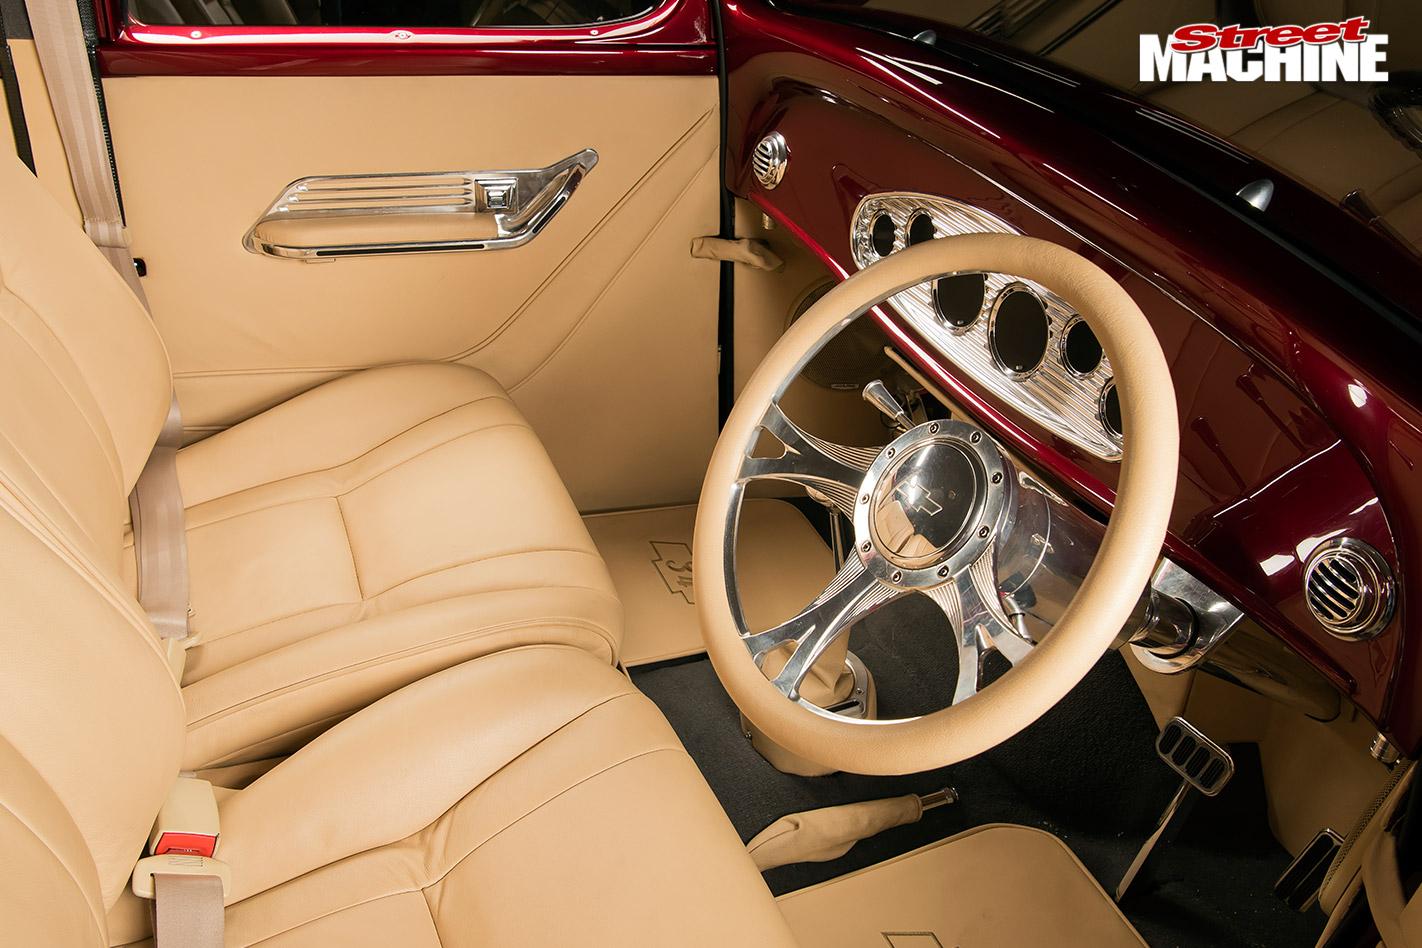 Chevy four-door sedan interior front